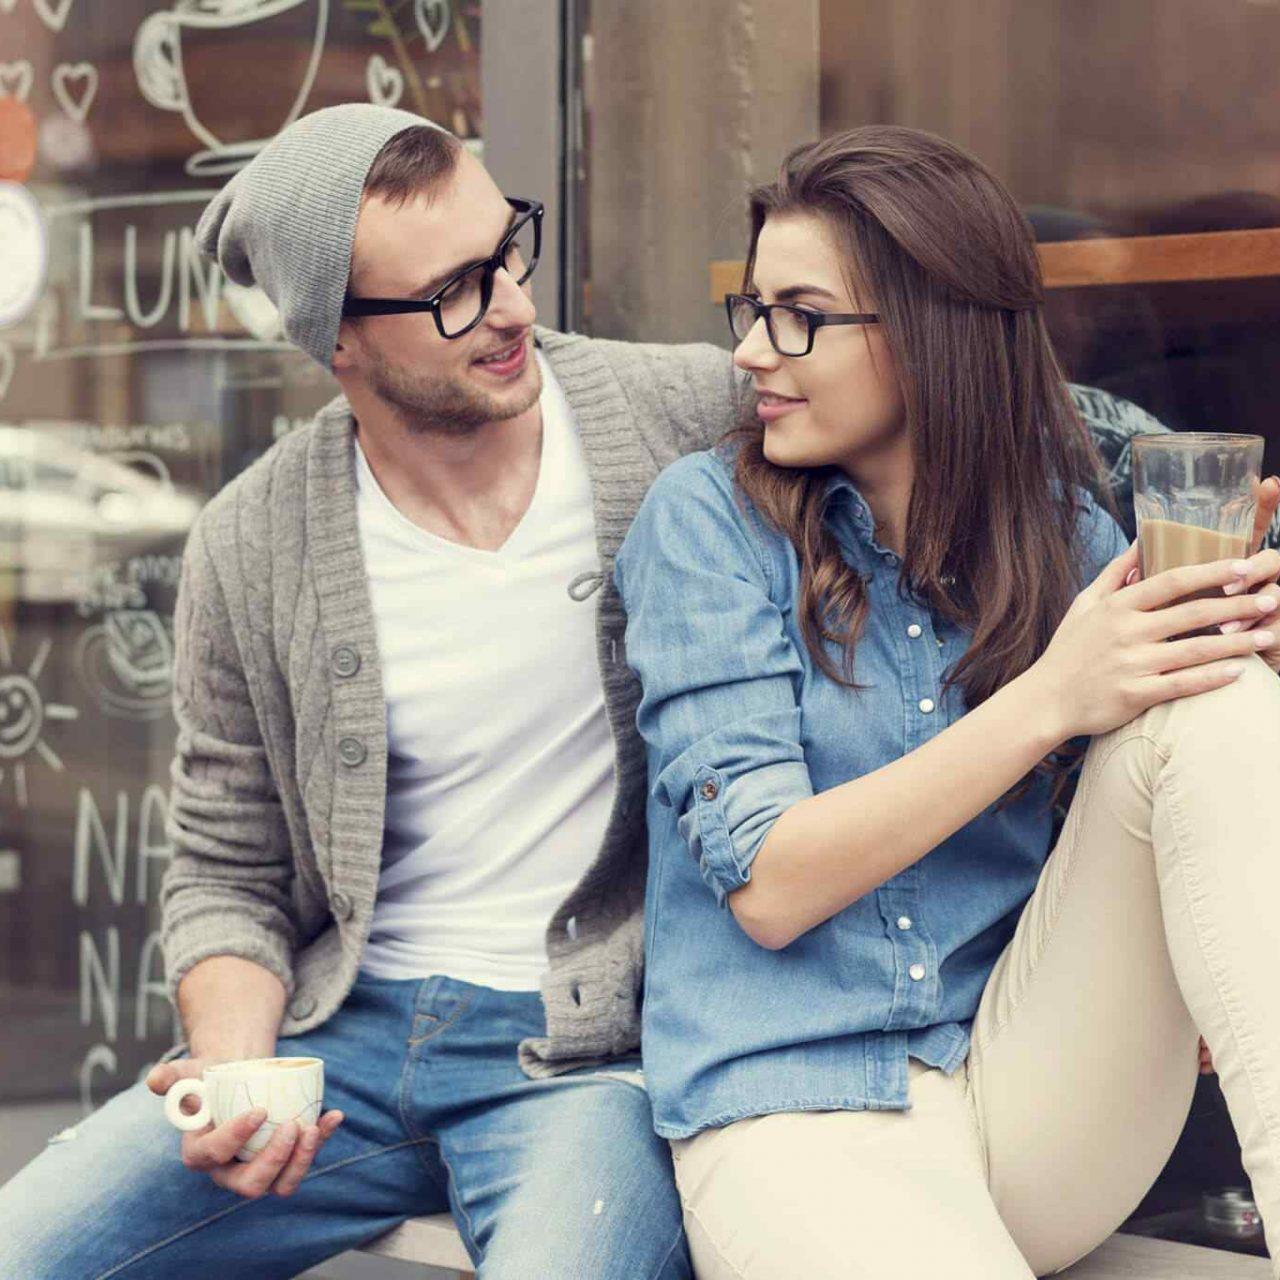 http://mirelasula.com/wp-content/uploads/2018/01/img-class-marriage-02-1280x1280.jpg